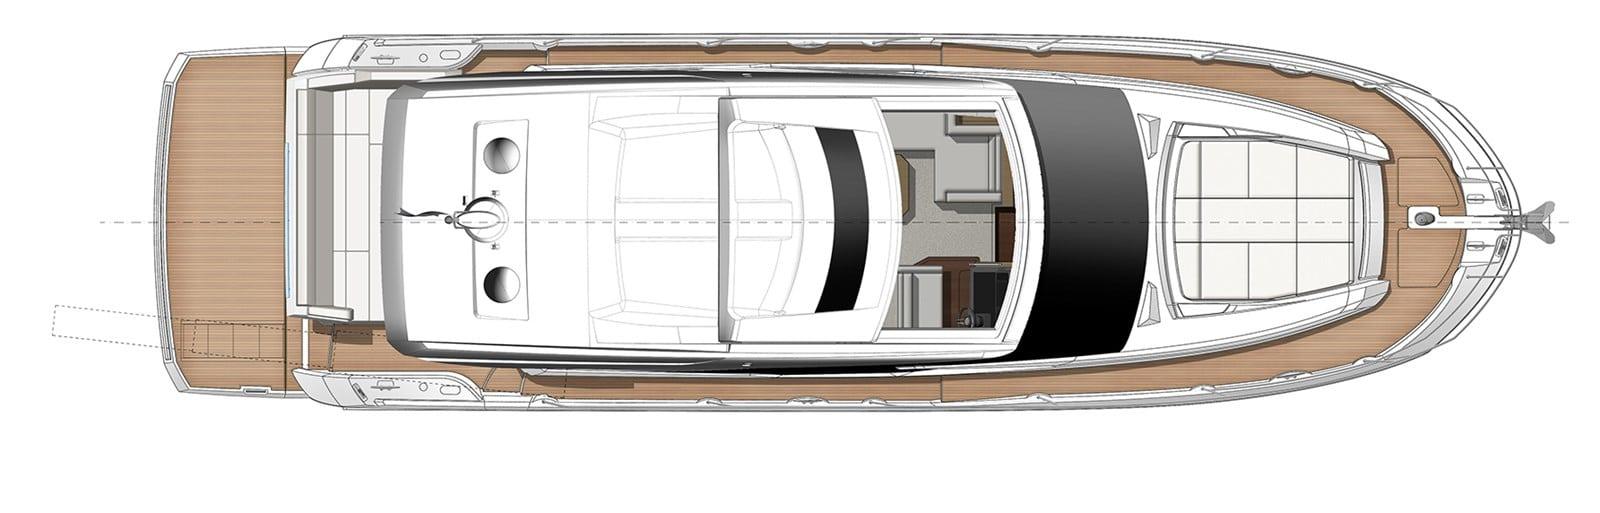 prestige yacht 520s yacht rendering